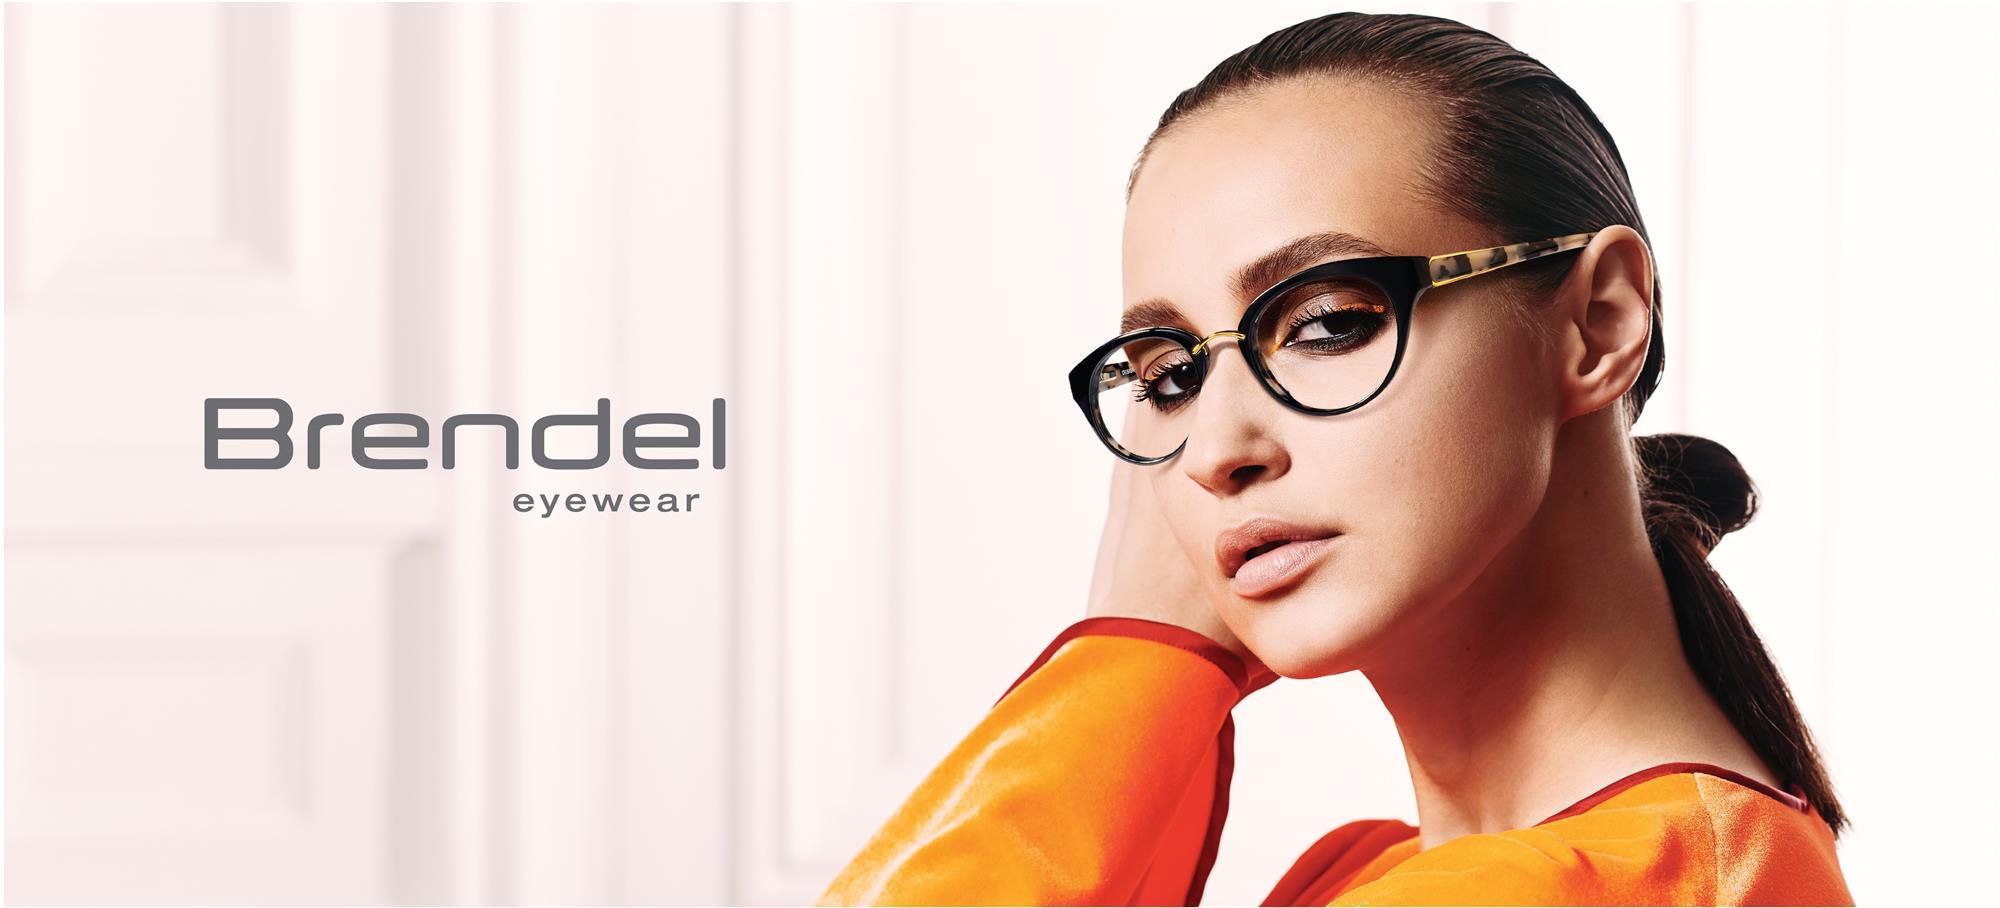 Brendel eyewear Brendel 906124 50 rosé/roségold fI07L